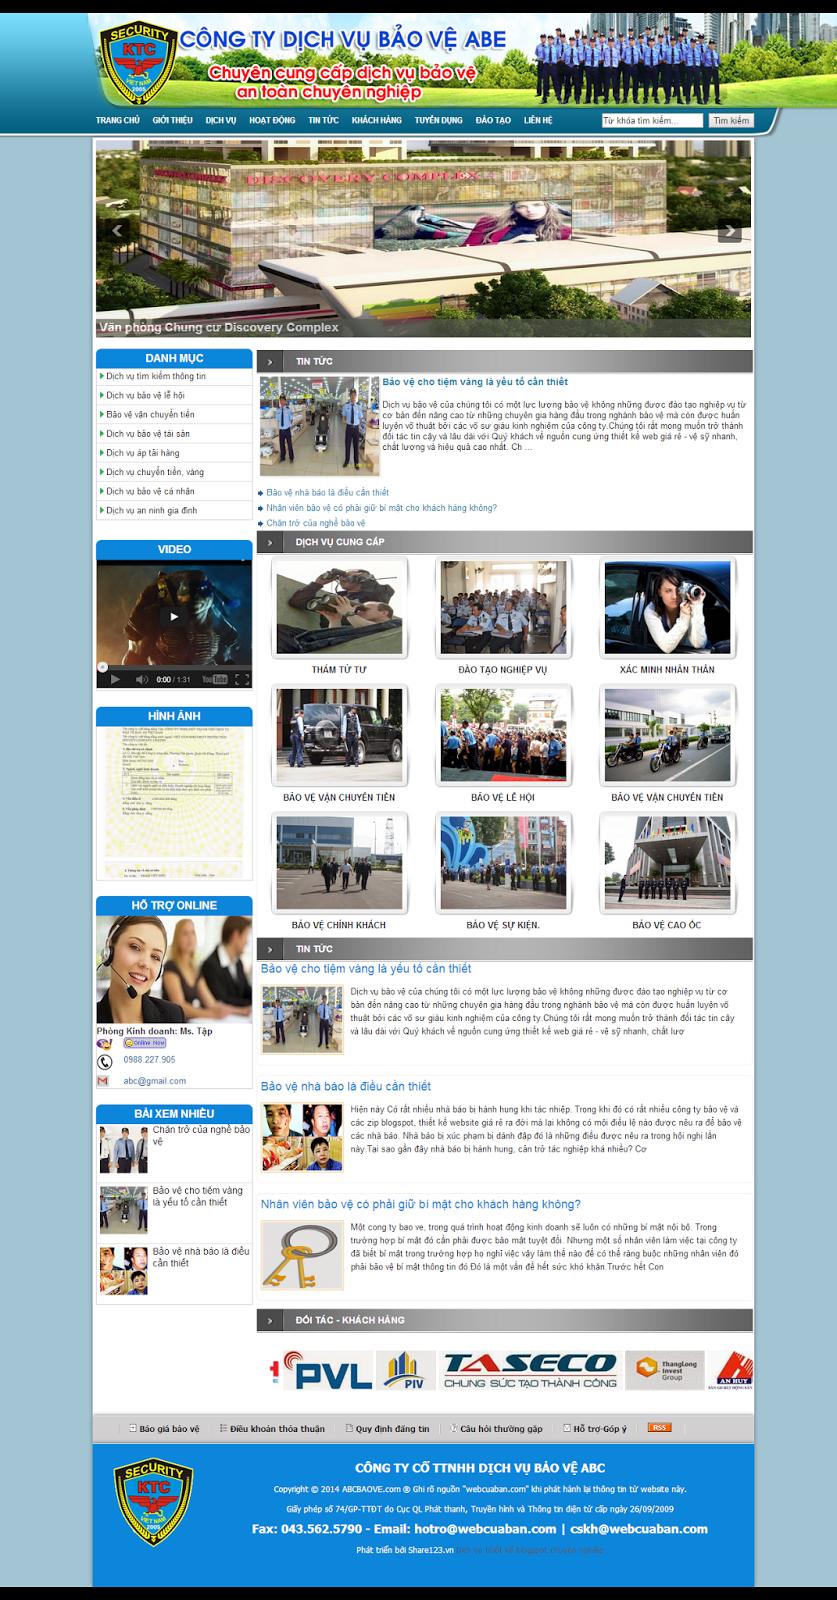 Mẫu website bảo vệ bằng blogspot đẹp